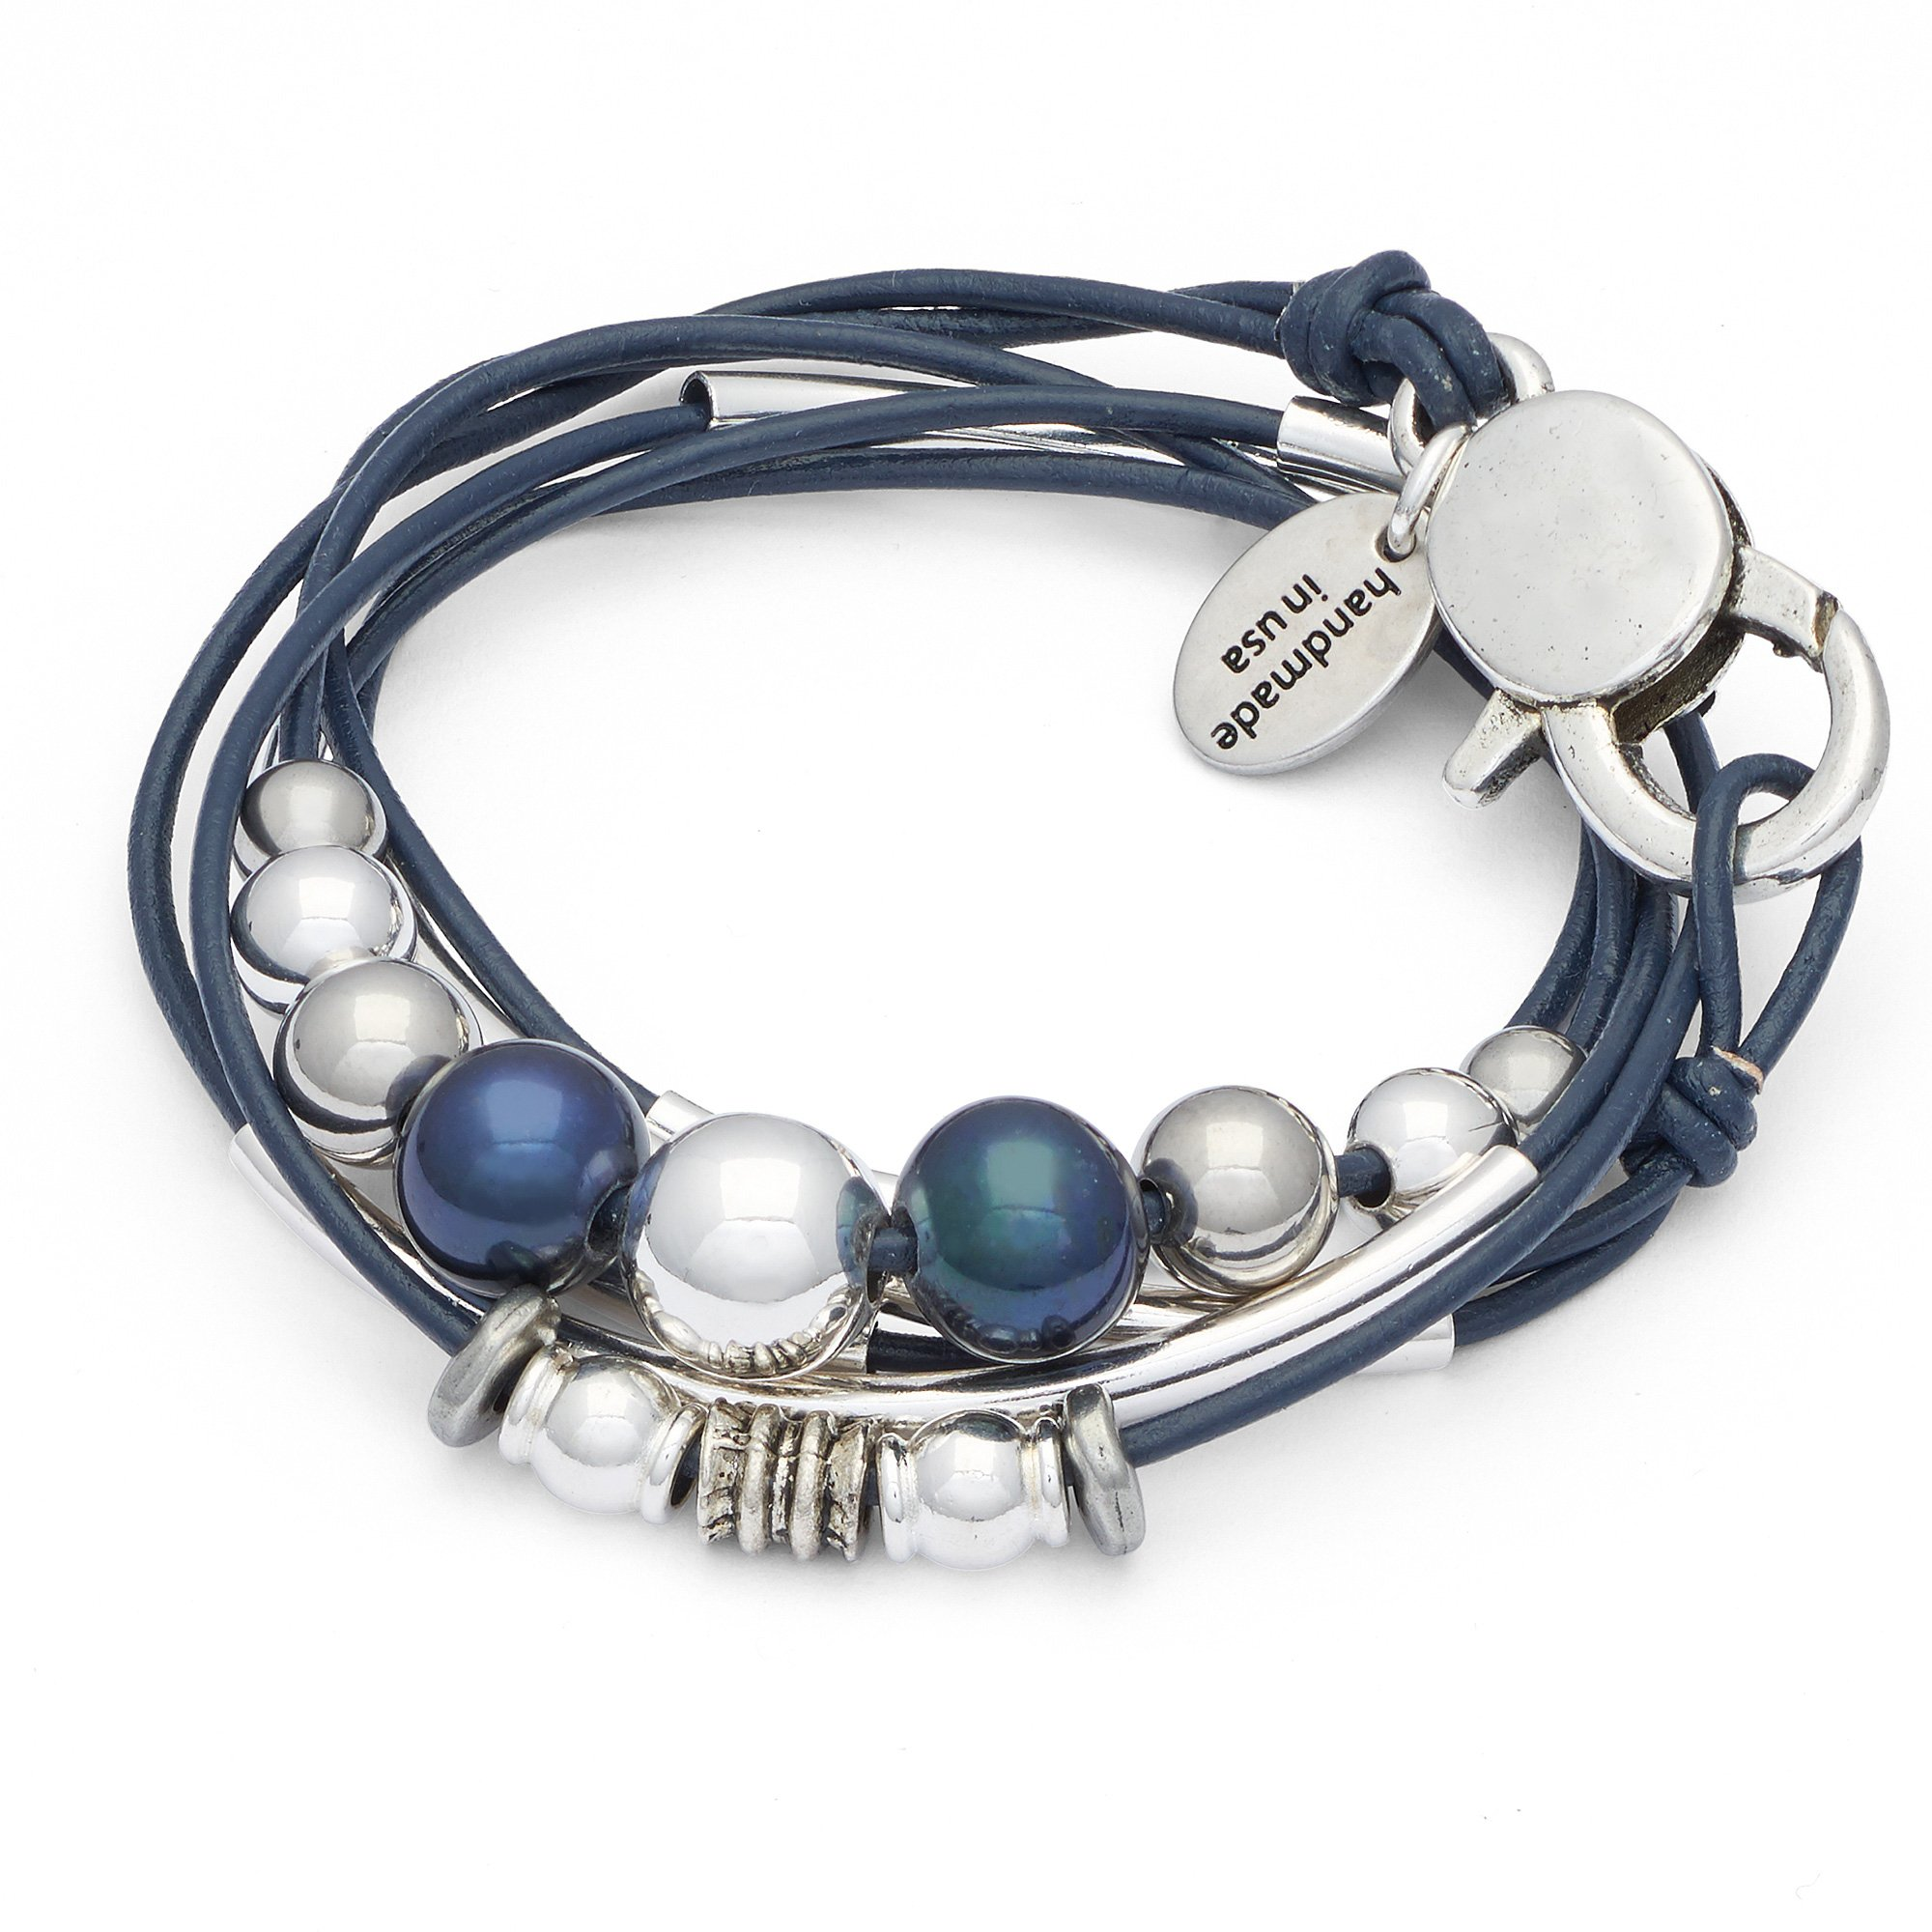 Lizzy James Mia 2 Strand Wrap Bracelet Necklace in Gloss Navy Leather by (Petite)